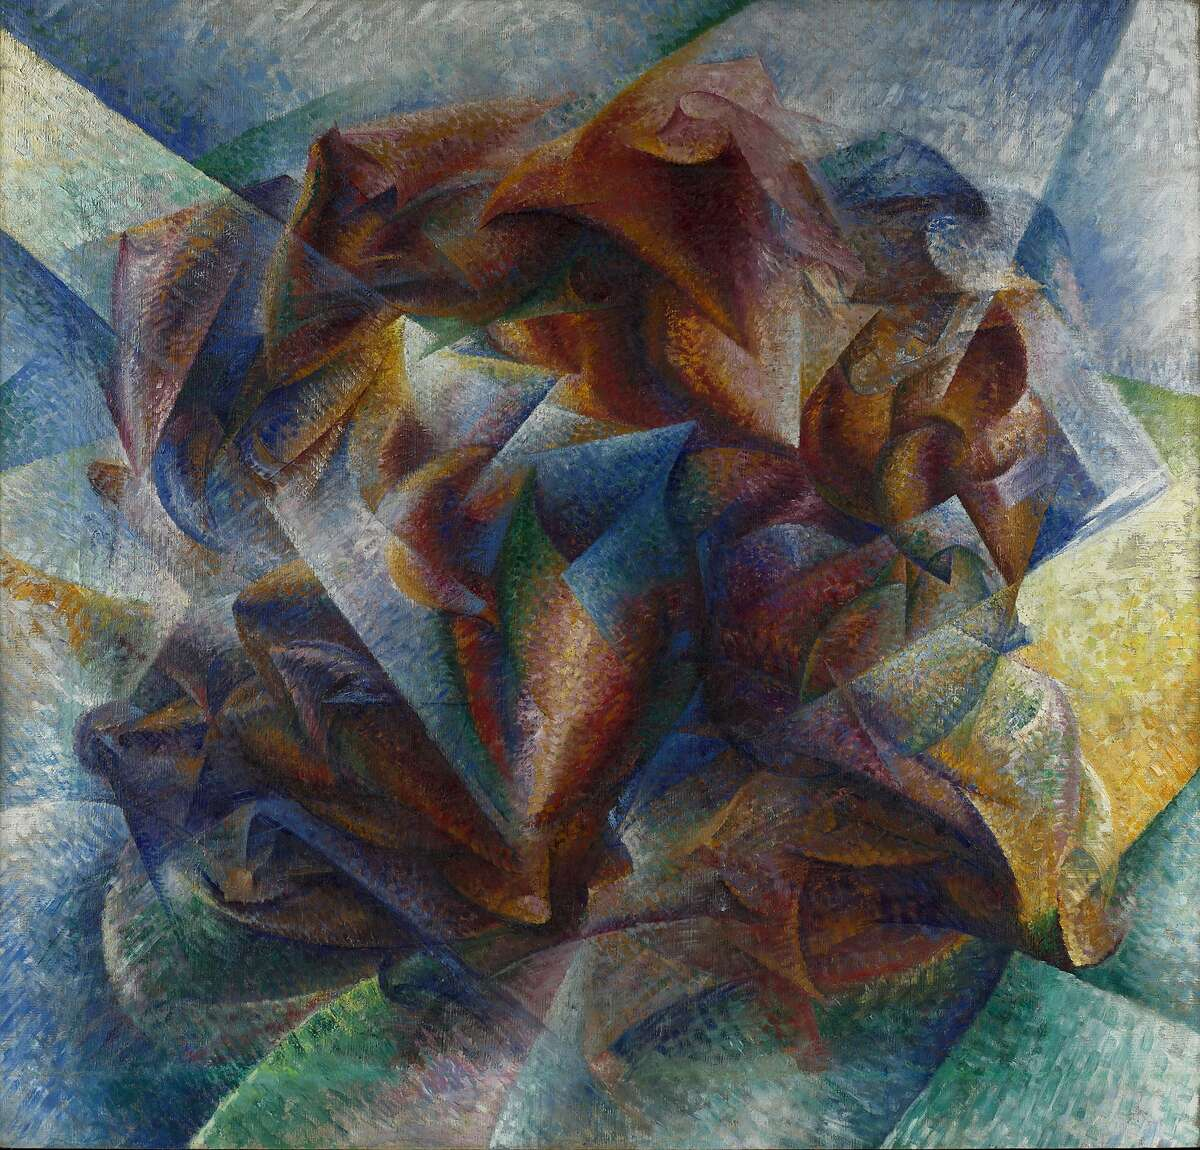 Italian Futurist Umberto Boccioni's 1913 oil painting,